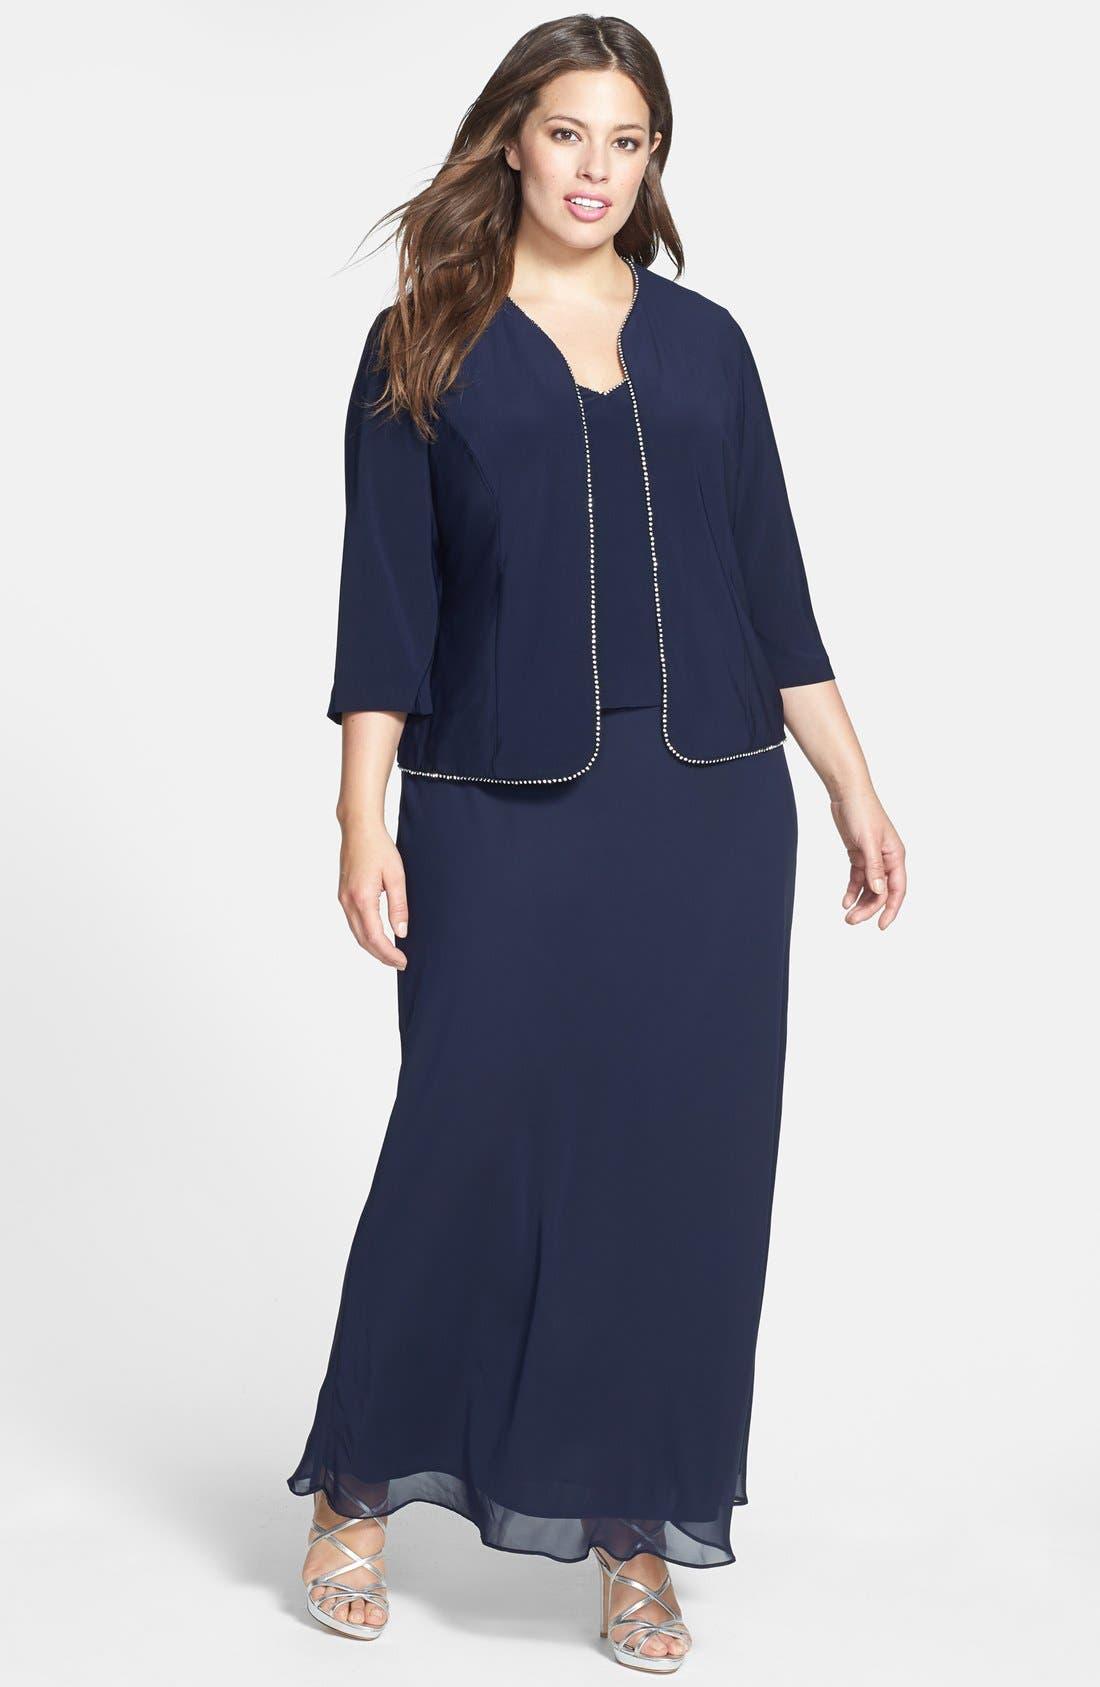 Main Image - Alex Evenings Rhinestone Trim Gown & Jacket (Plus Size)